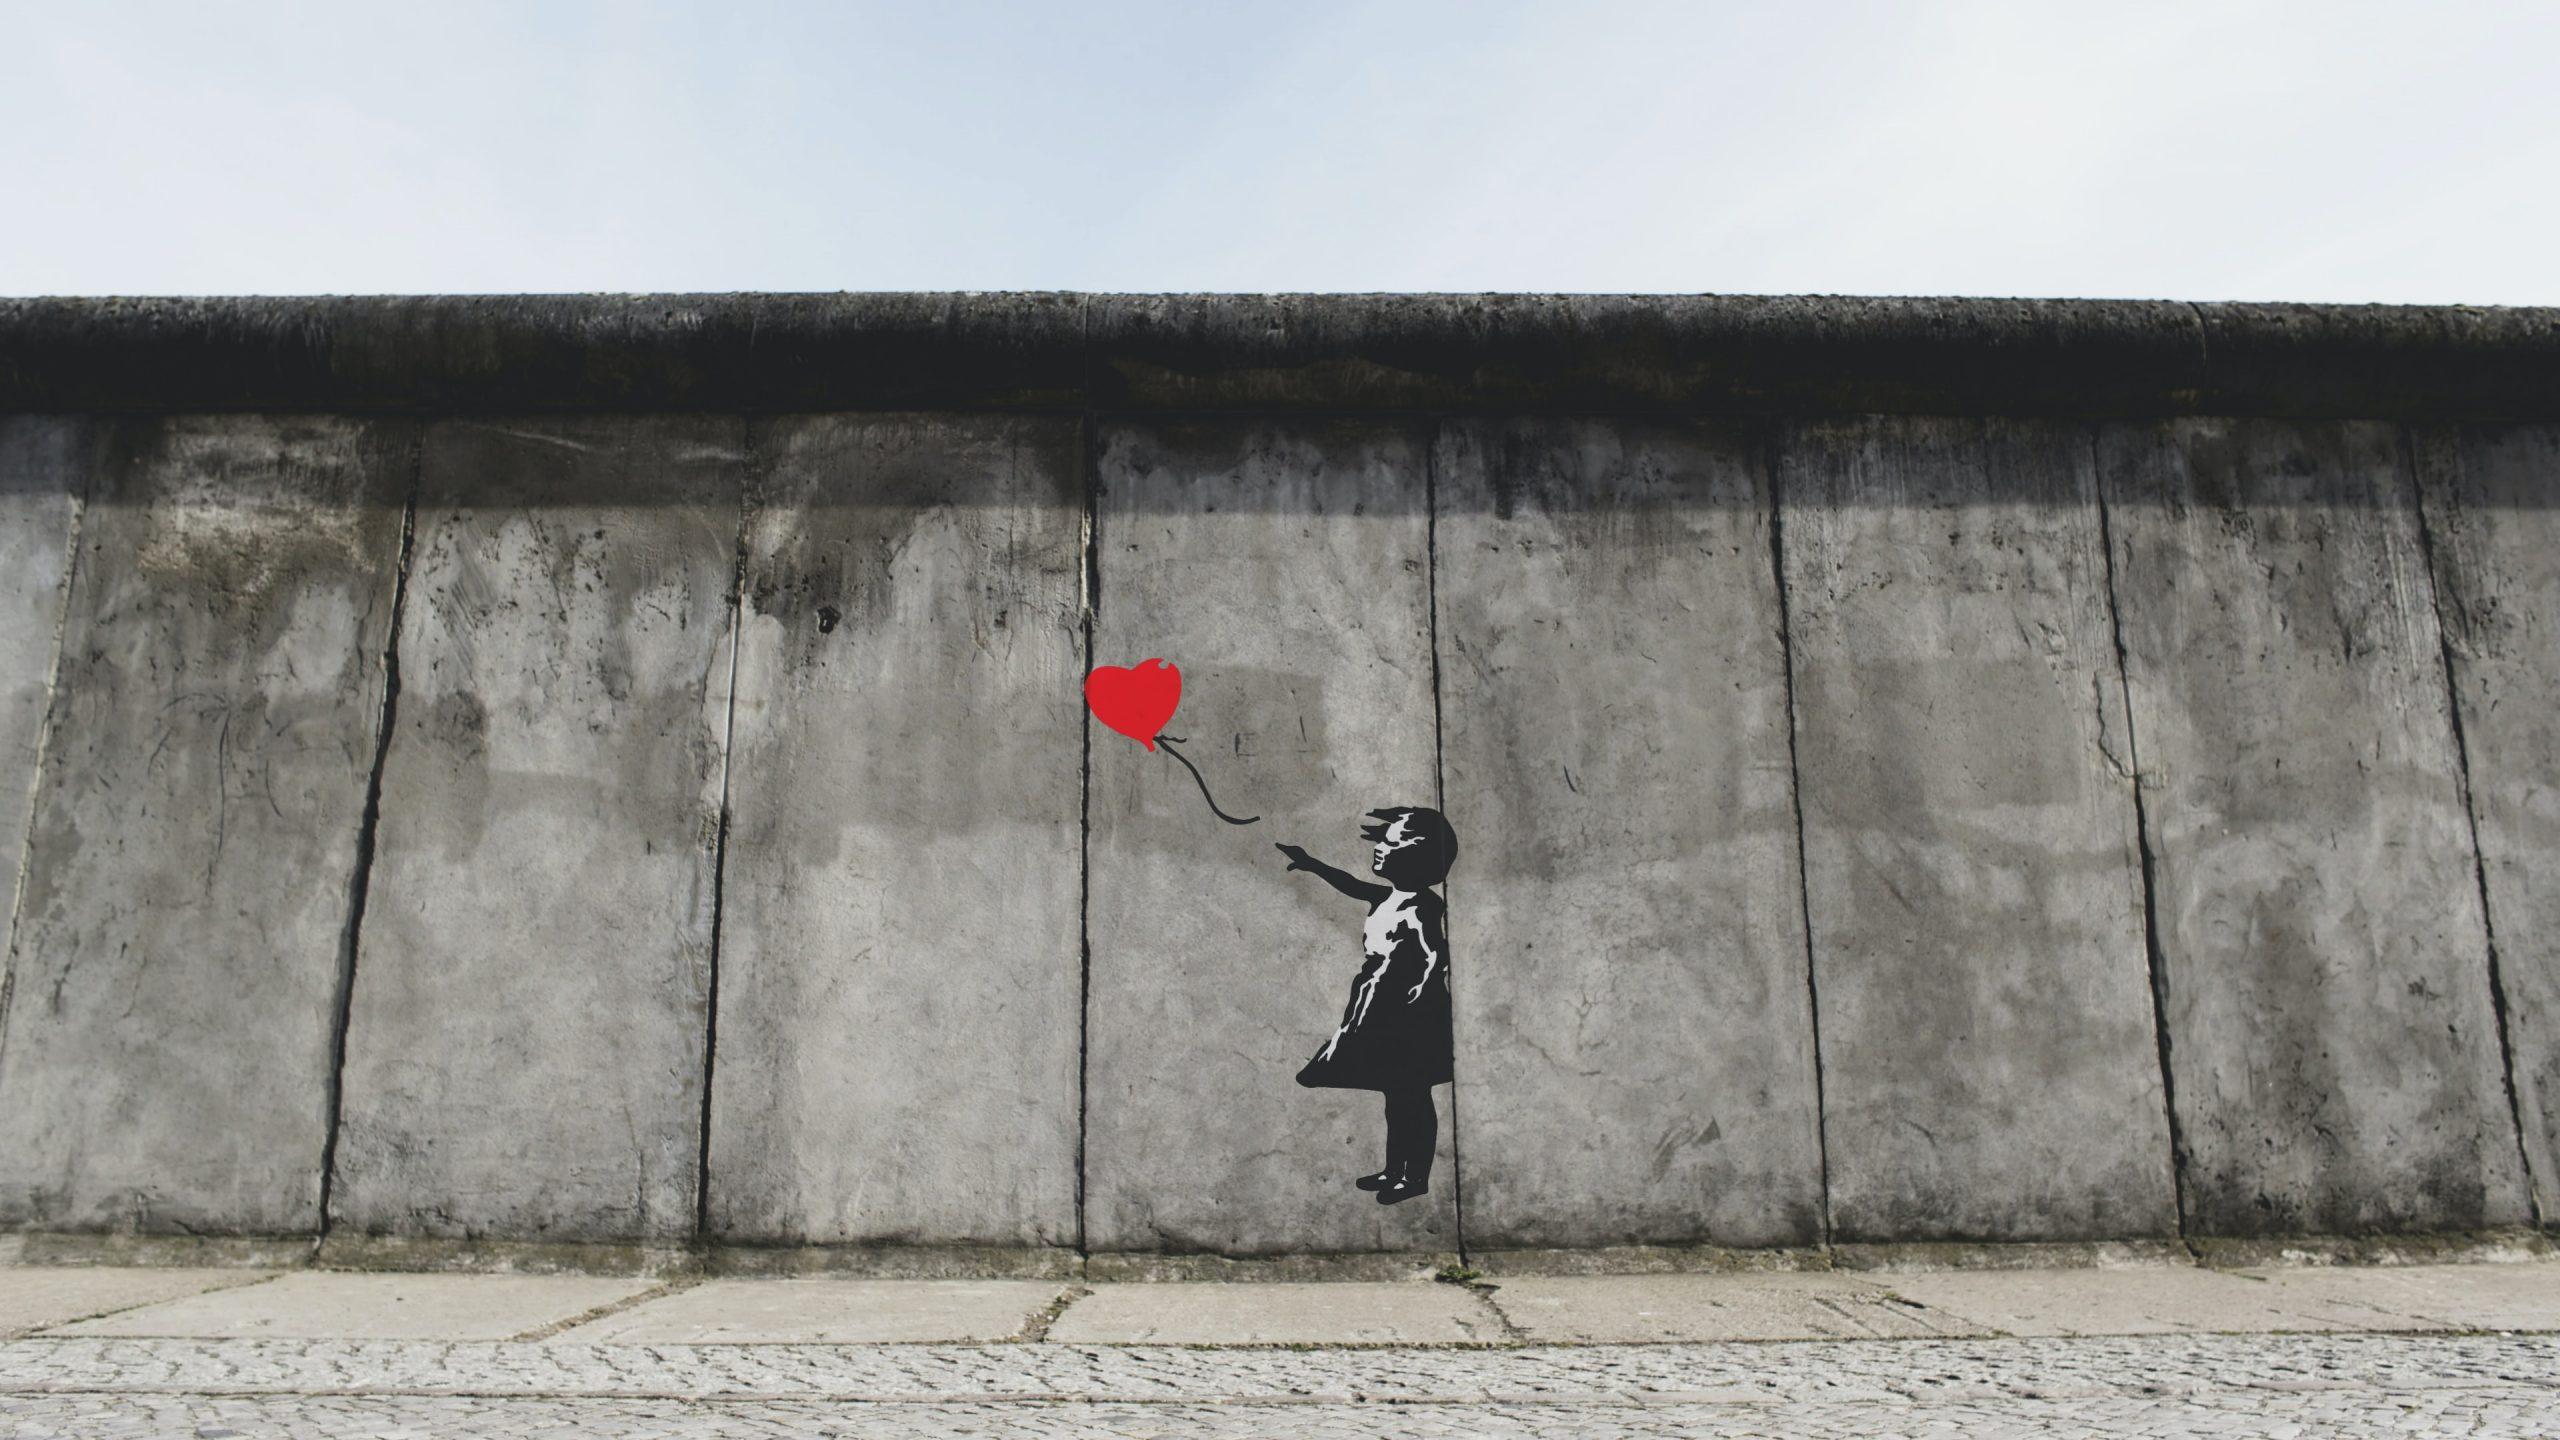 Banksy Loses Two-Year Long Trademark Dispute Over 'Flower Thrower' Artwork